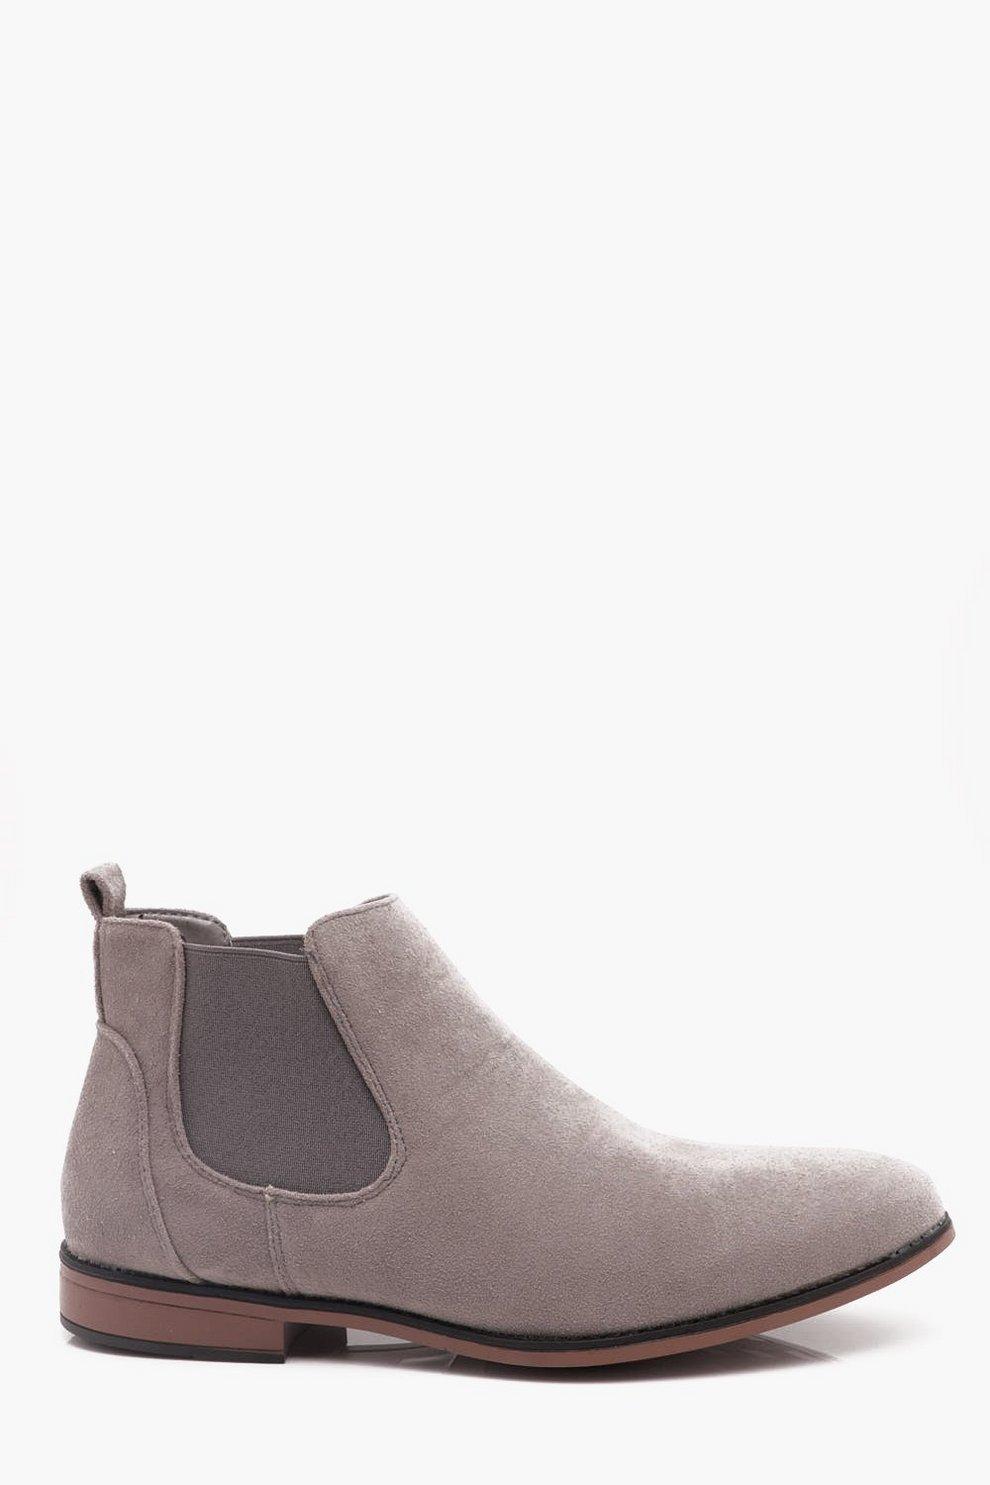 caf6dc51cc1fd Light Grey Faux Suede Chelsea Boots - boohooMAN